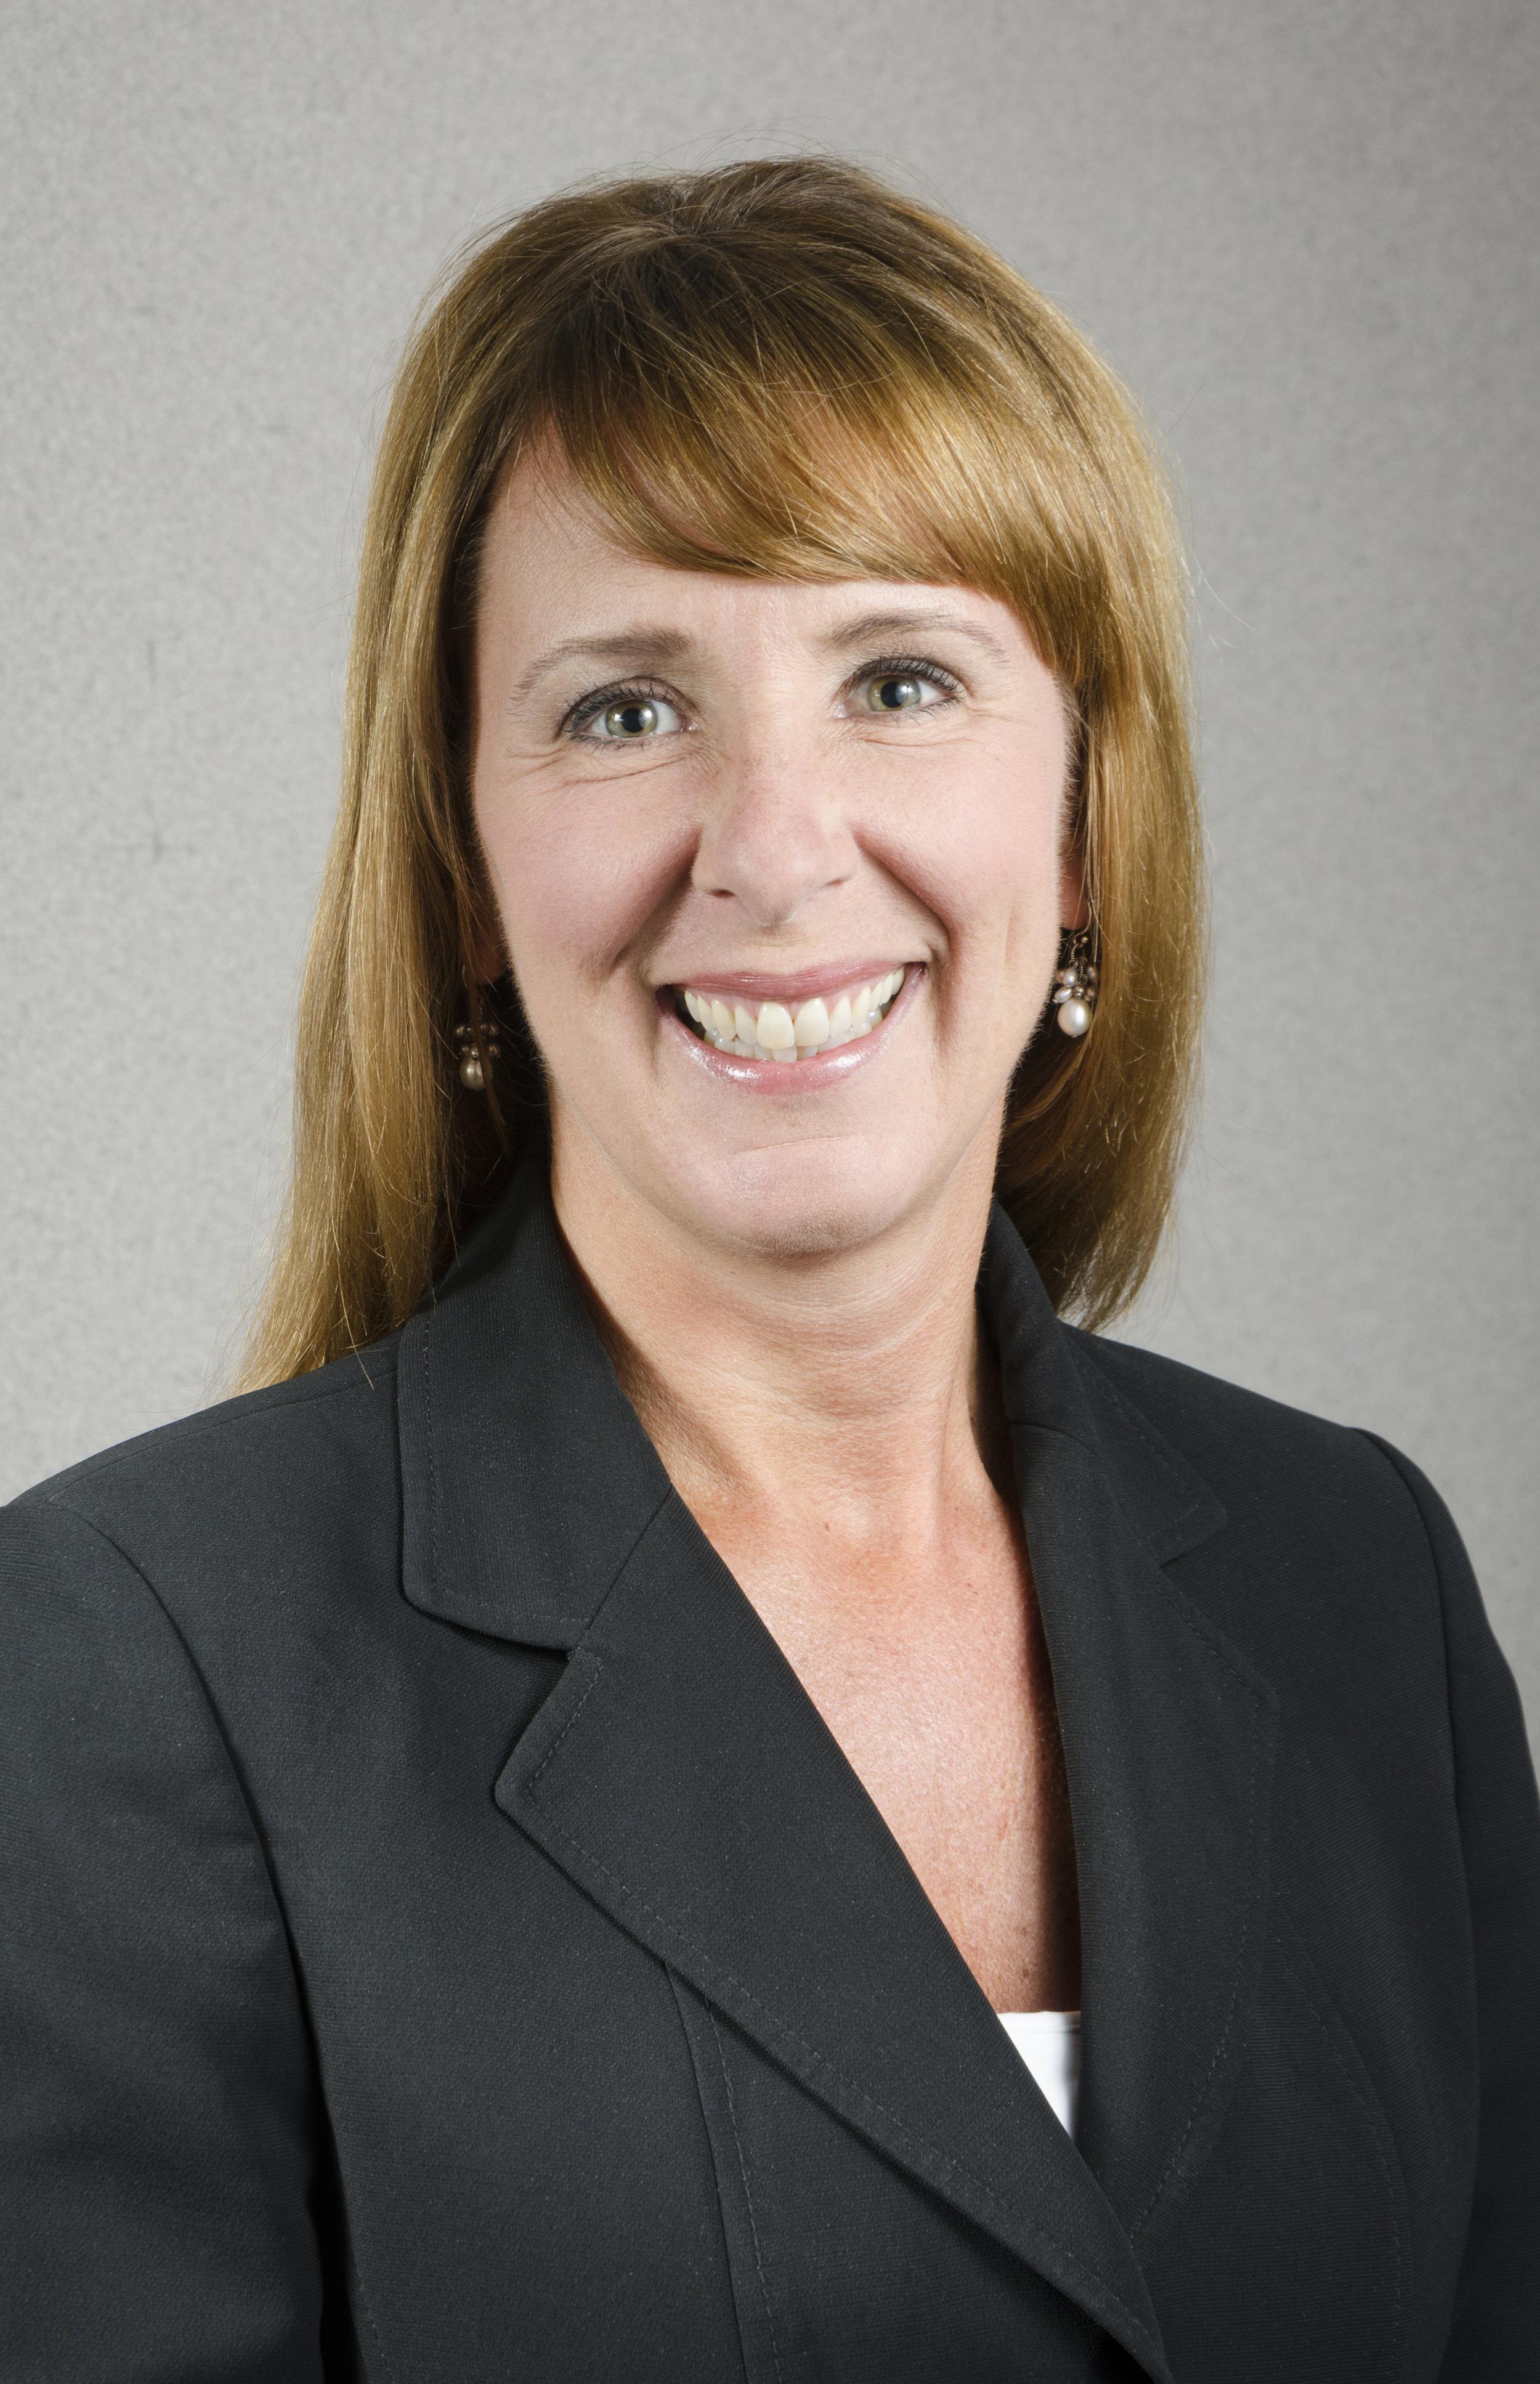 Lisa Thompson, Corporate Director of Sales, Marketing, & Revenue Management